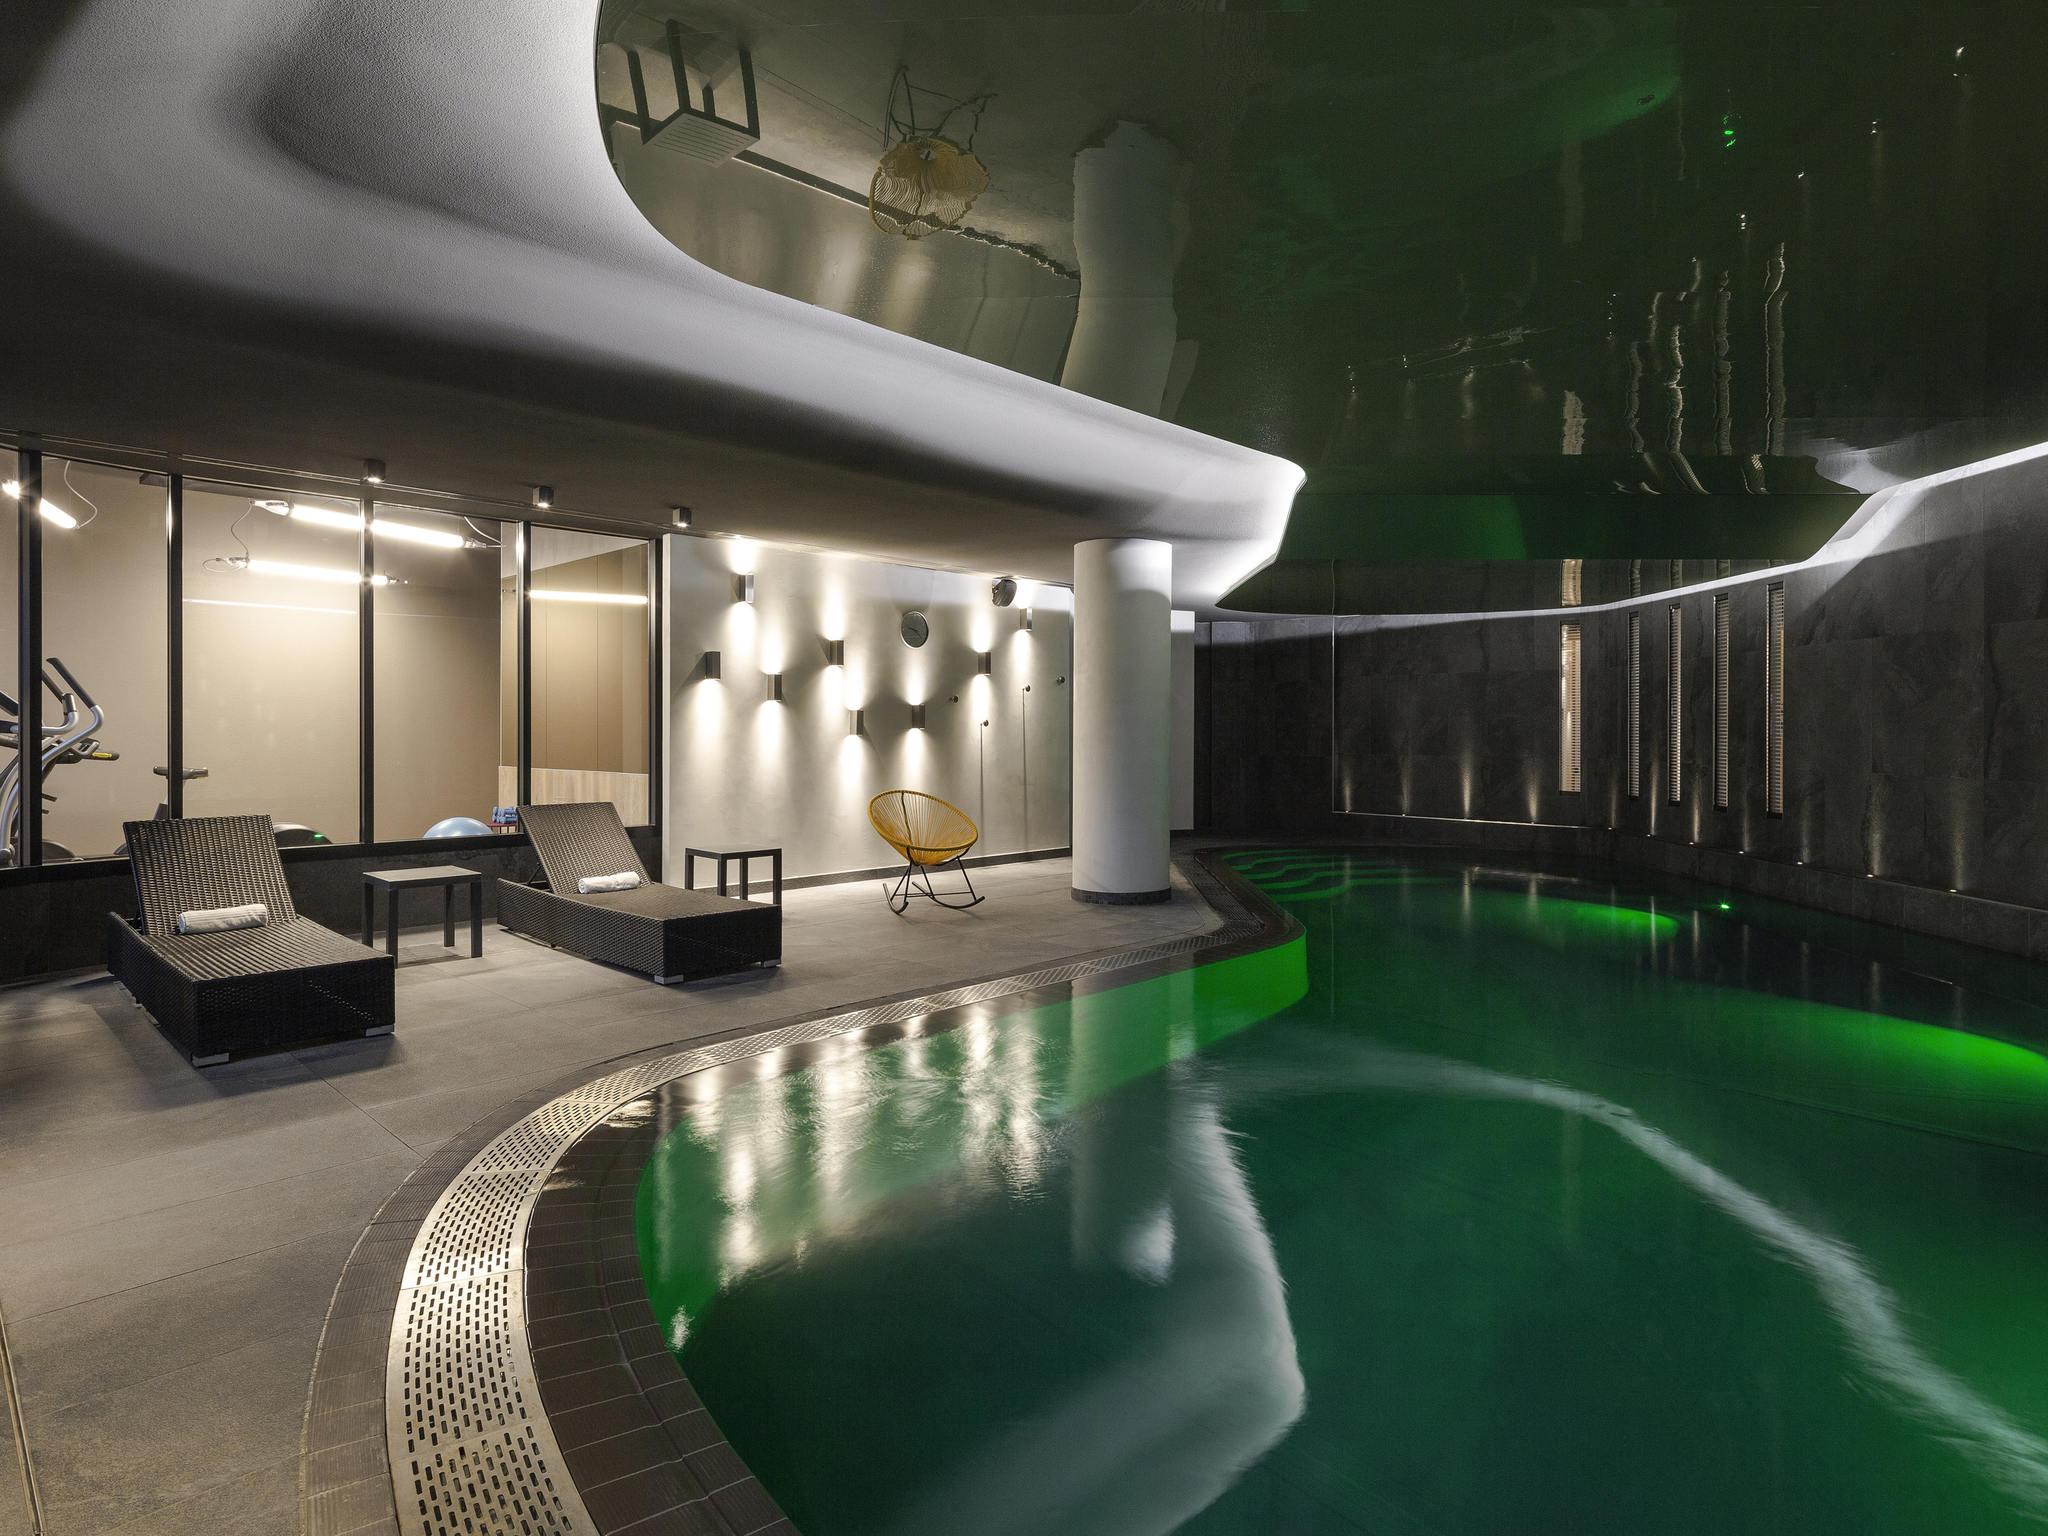 hotel en saint brieuc novotel saint brieuc centre gare. Black Bedroom Furniture Sets. Home Design Ideas